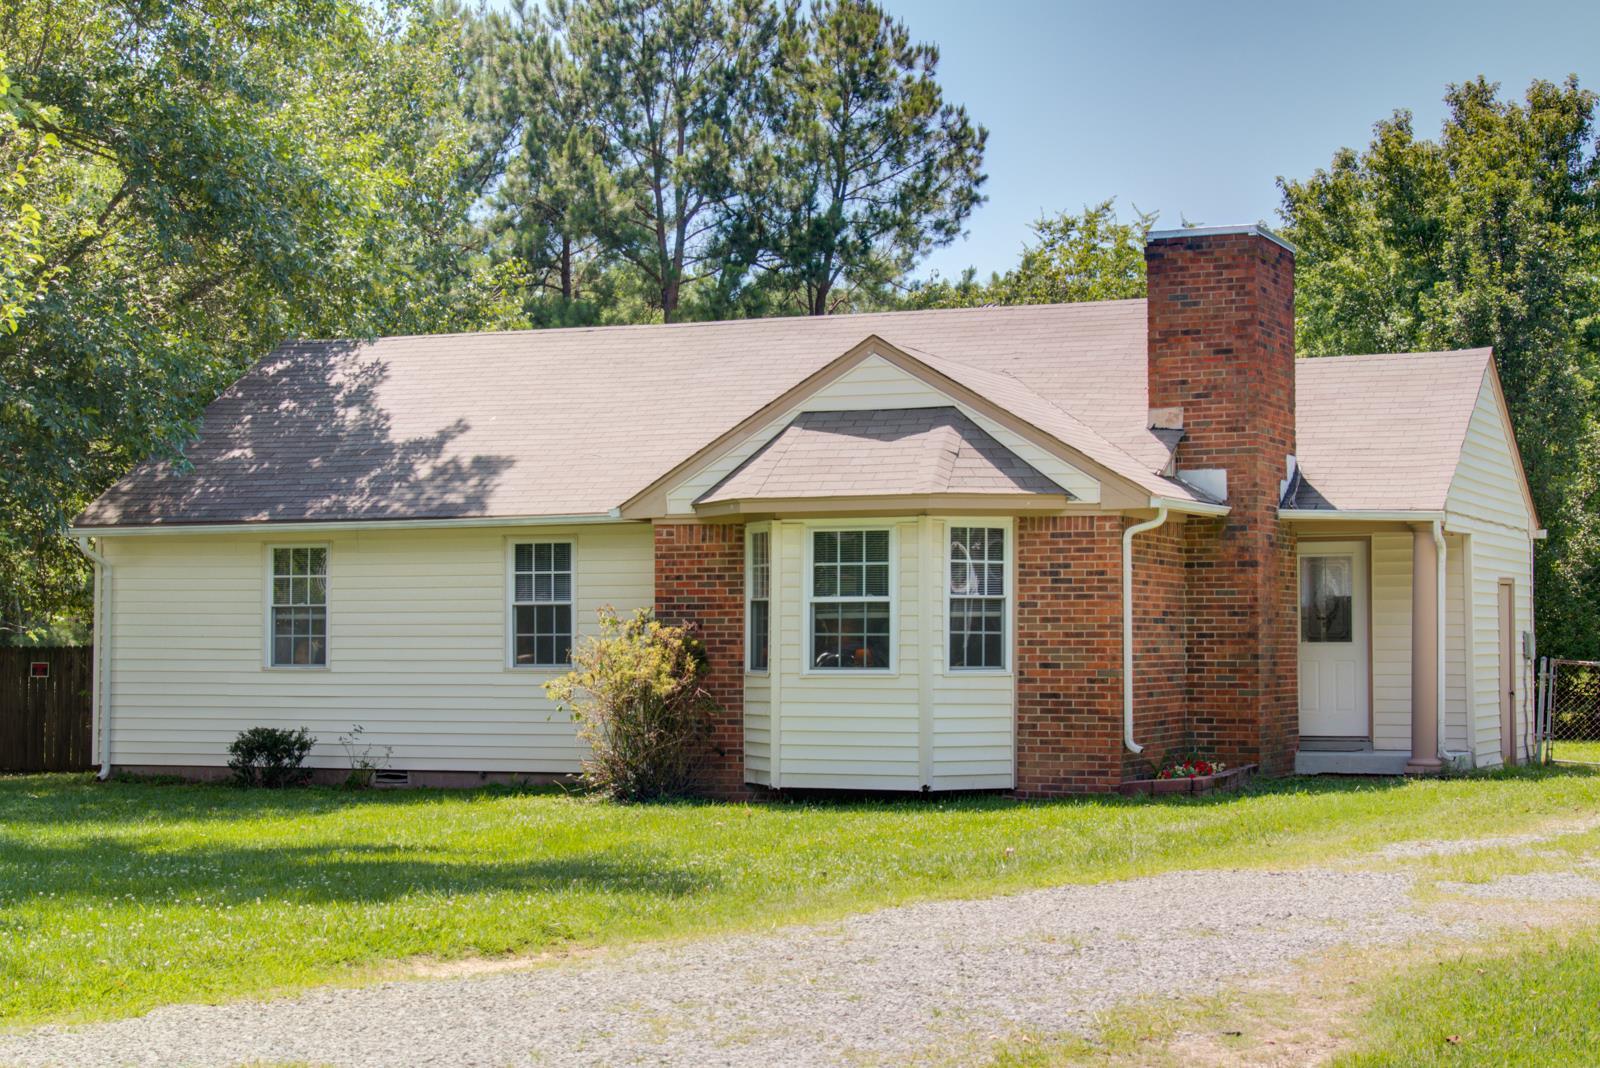 109 Sunnymeade Dr, Mount Juliet, TN 37122 - Mount Juliet, TN real estate listing